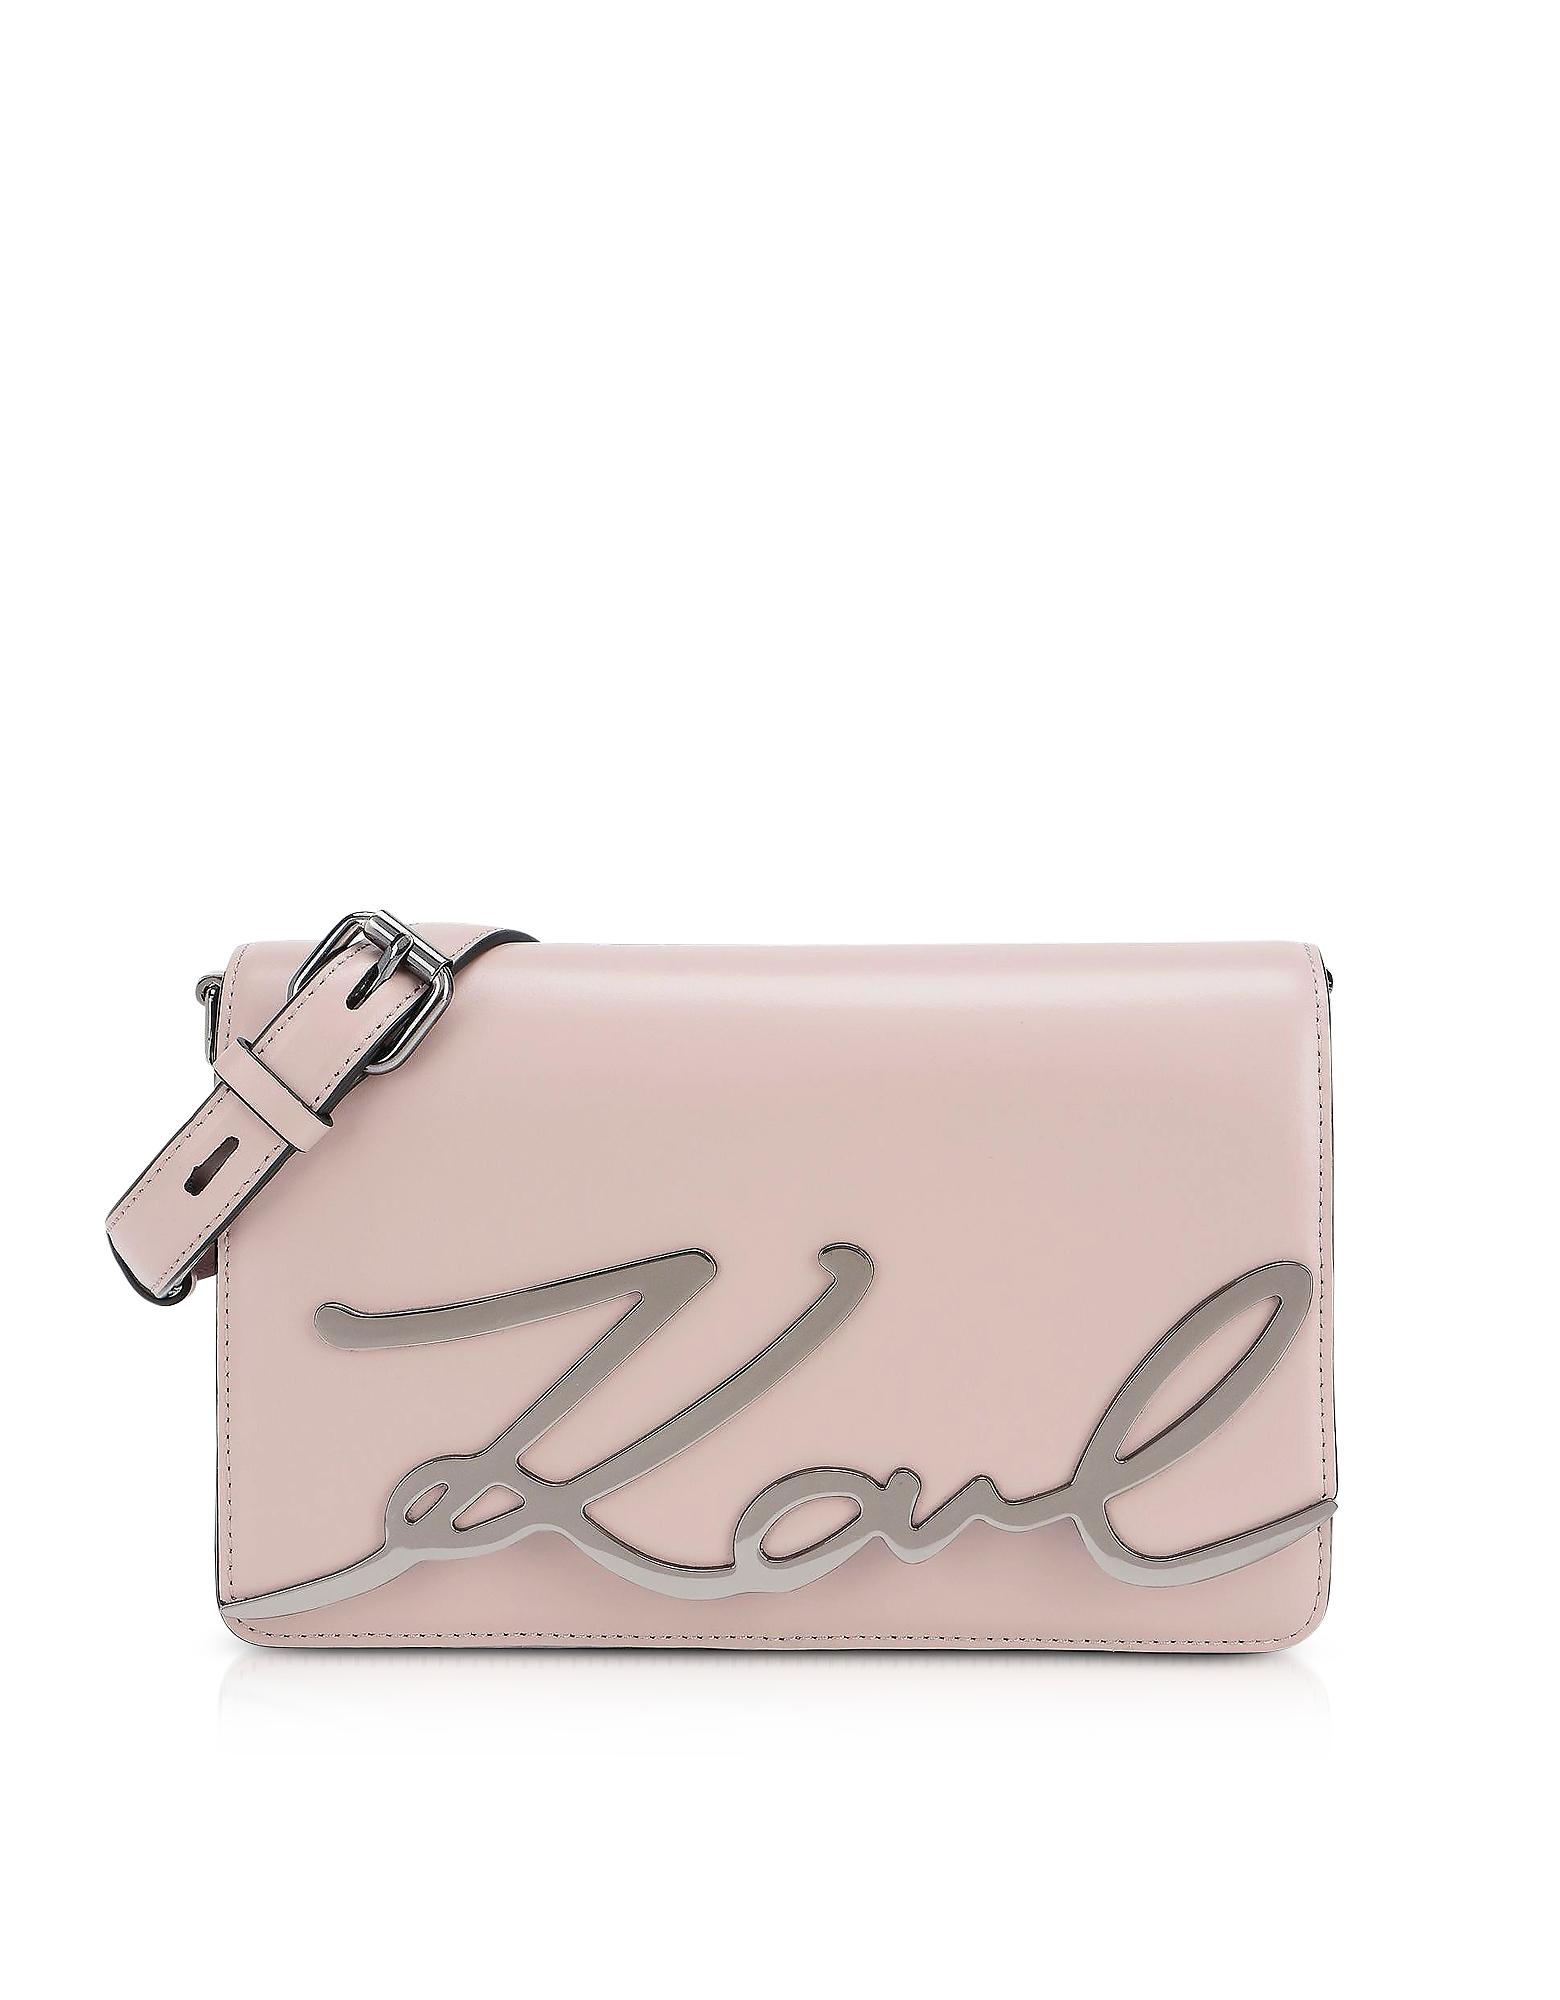 Karl Lagerfeld Handbags, K/Signature Shoulder Bag